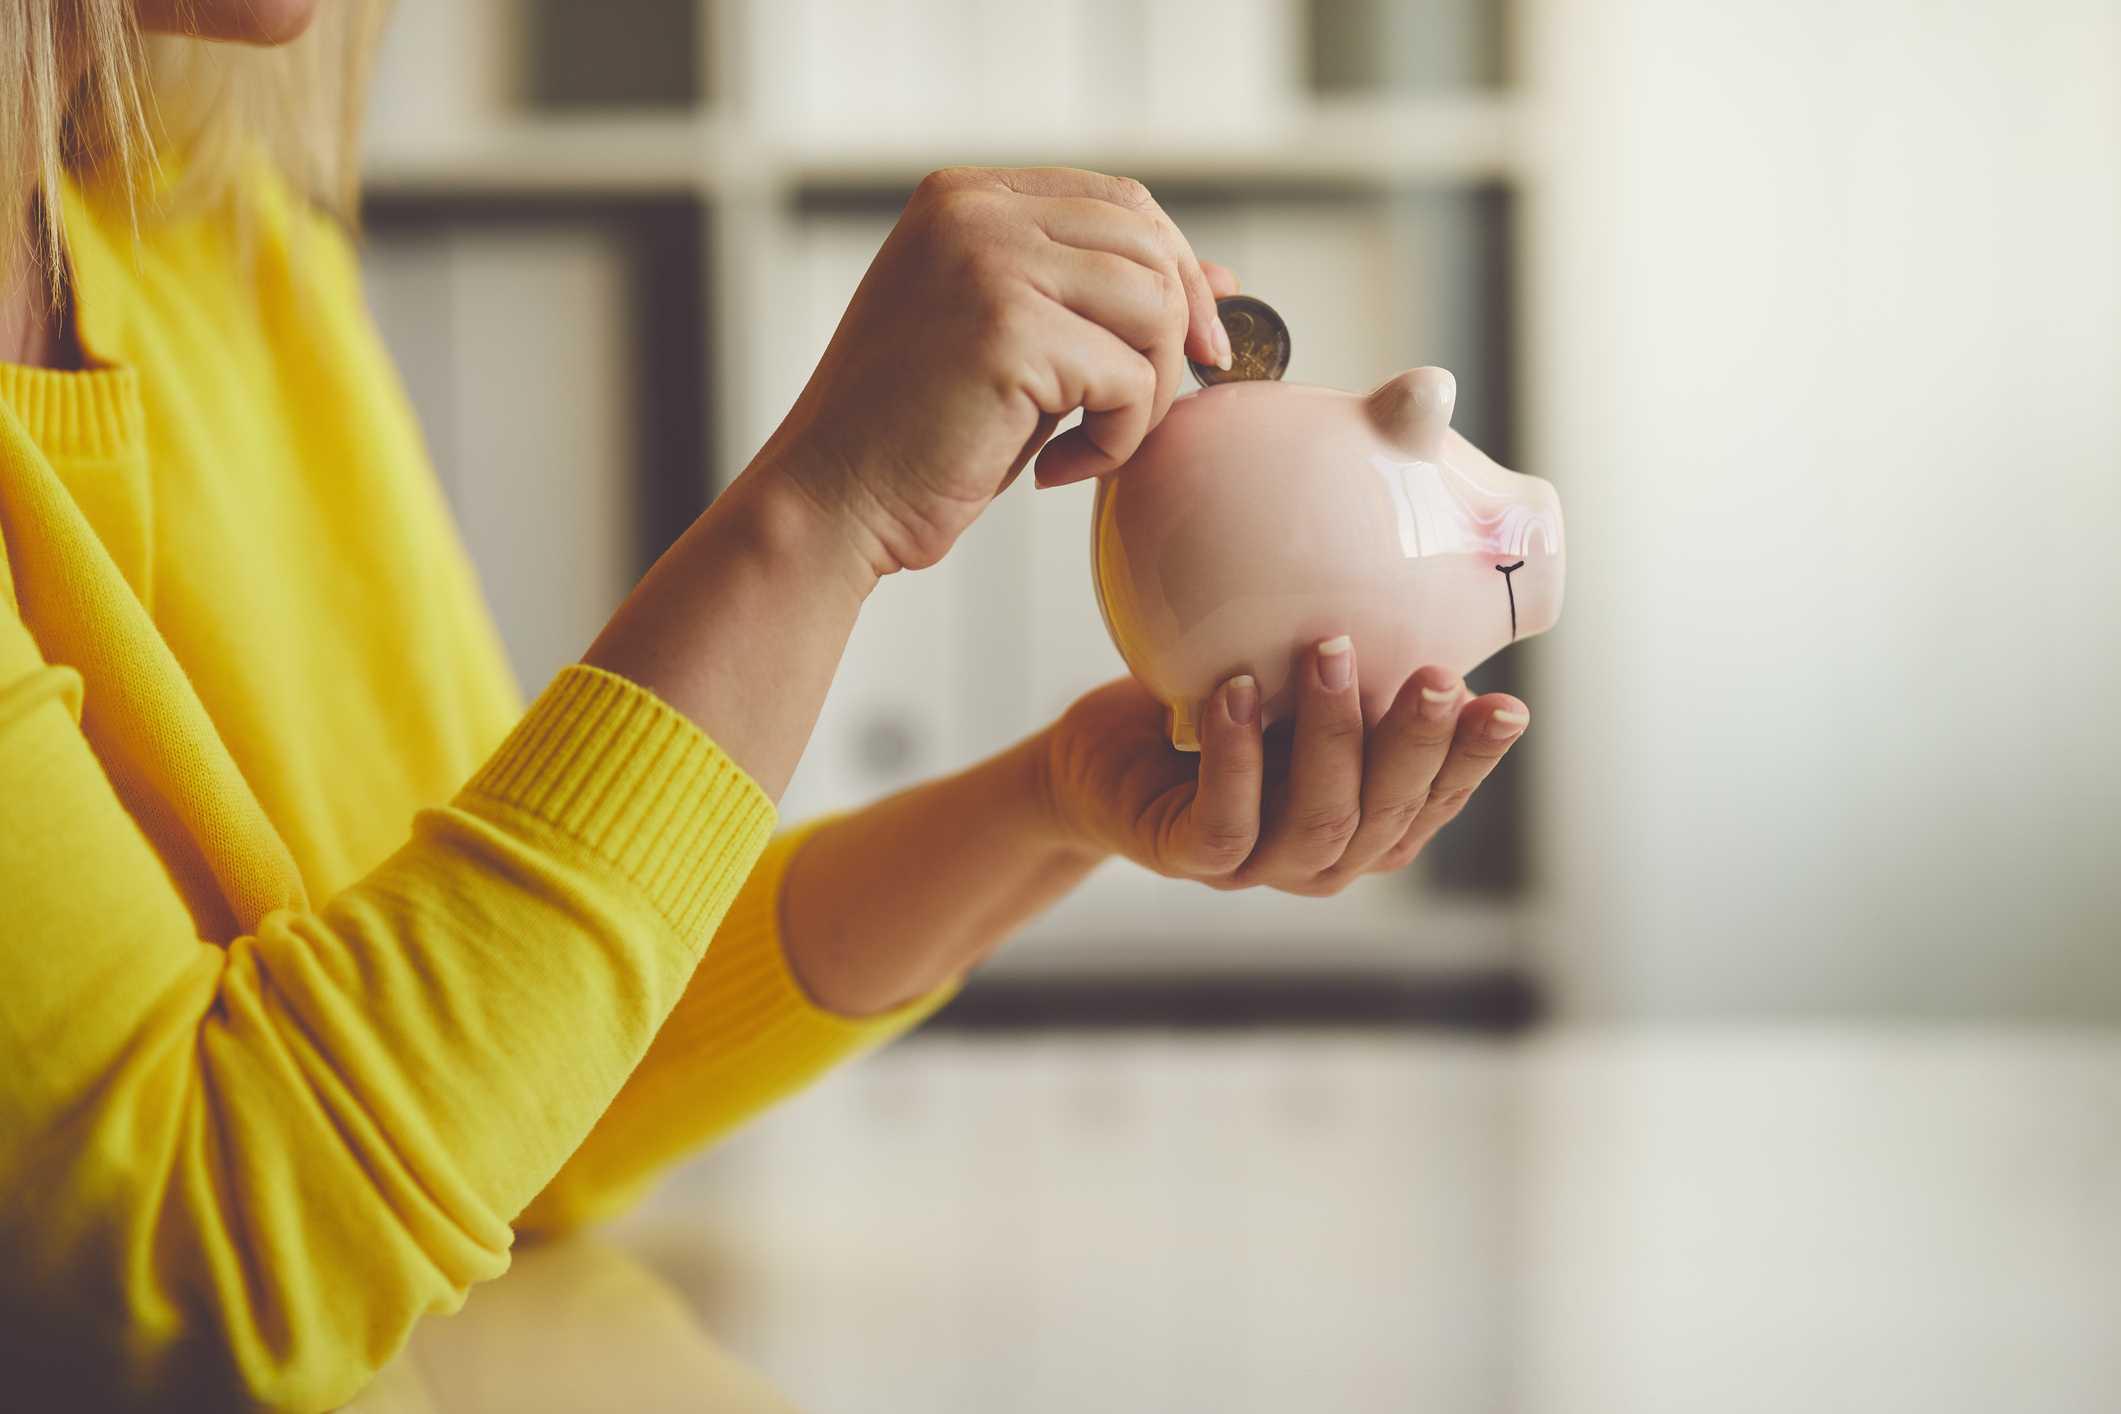 Diabetes and Saving Money